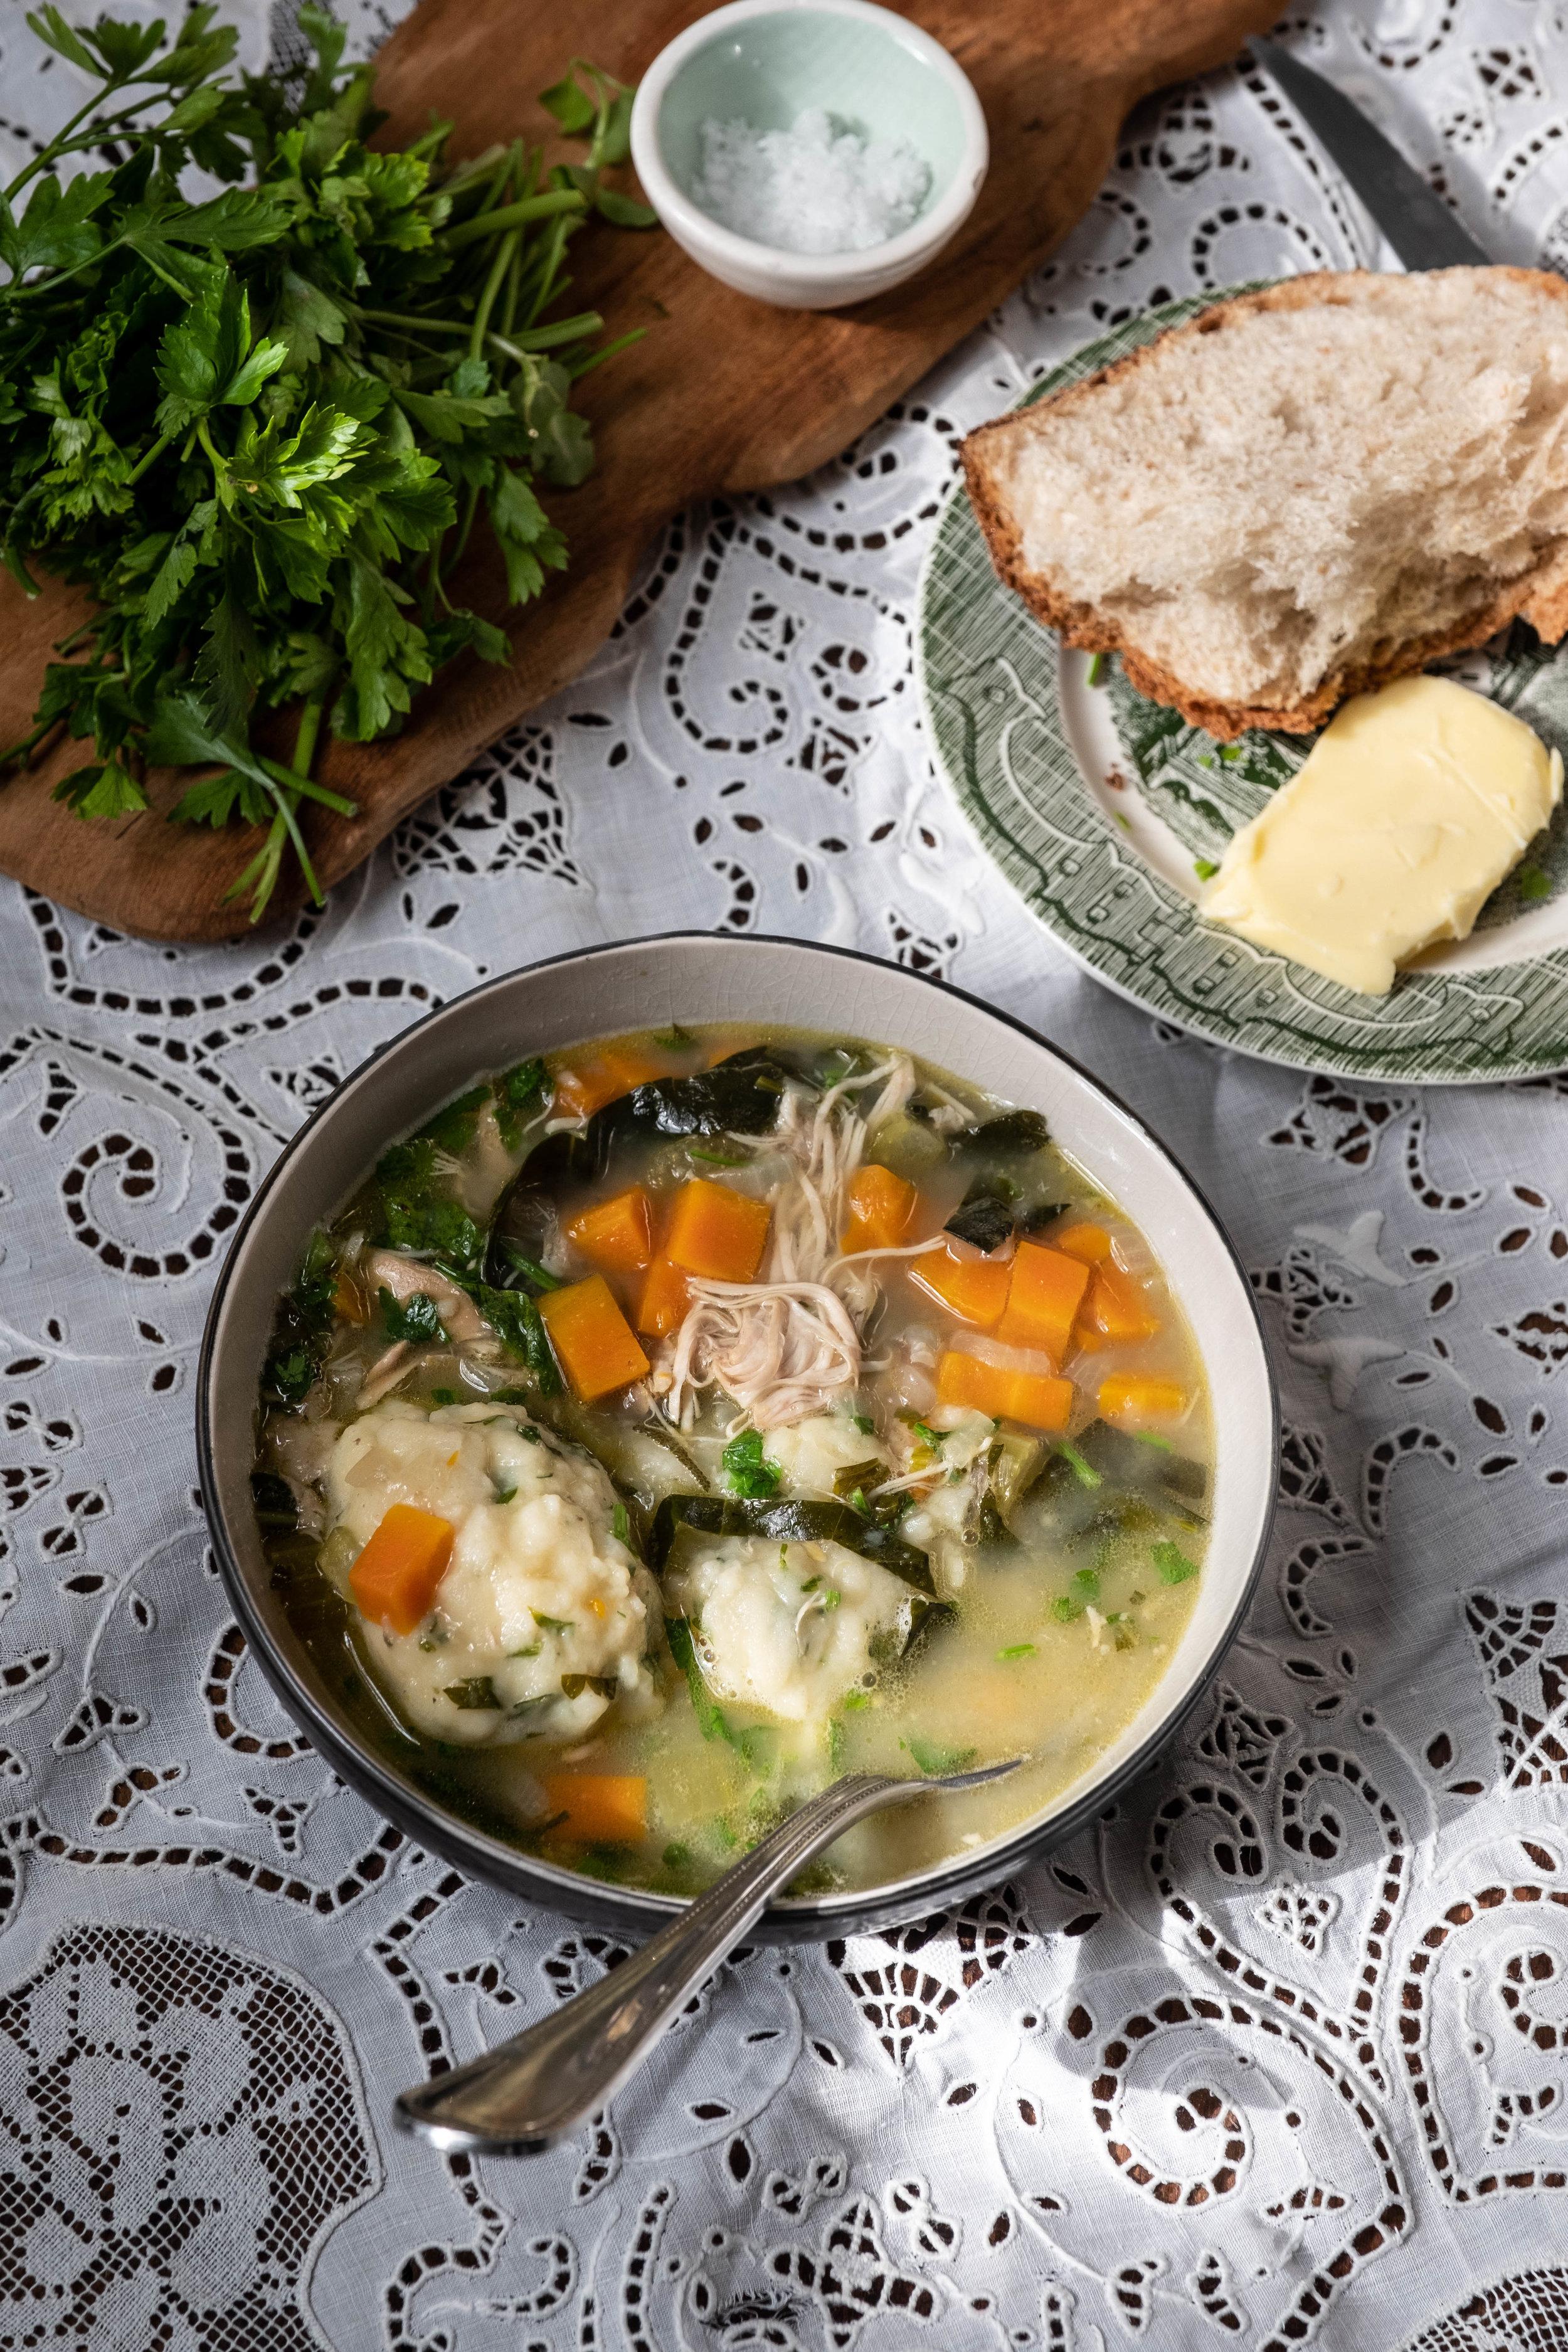 ROSE & IVY Journal A Bowl of Comfort | Herbed Chicken & Dumplings